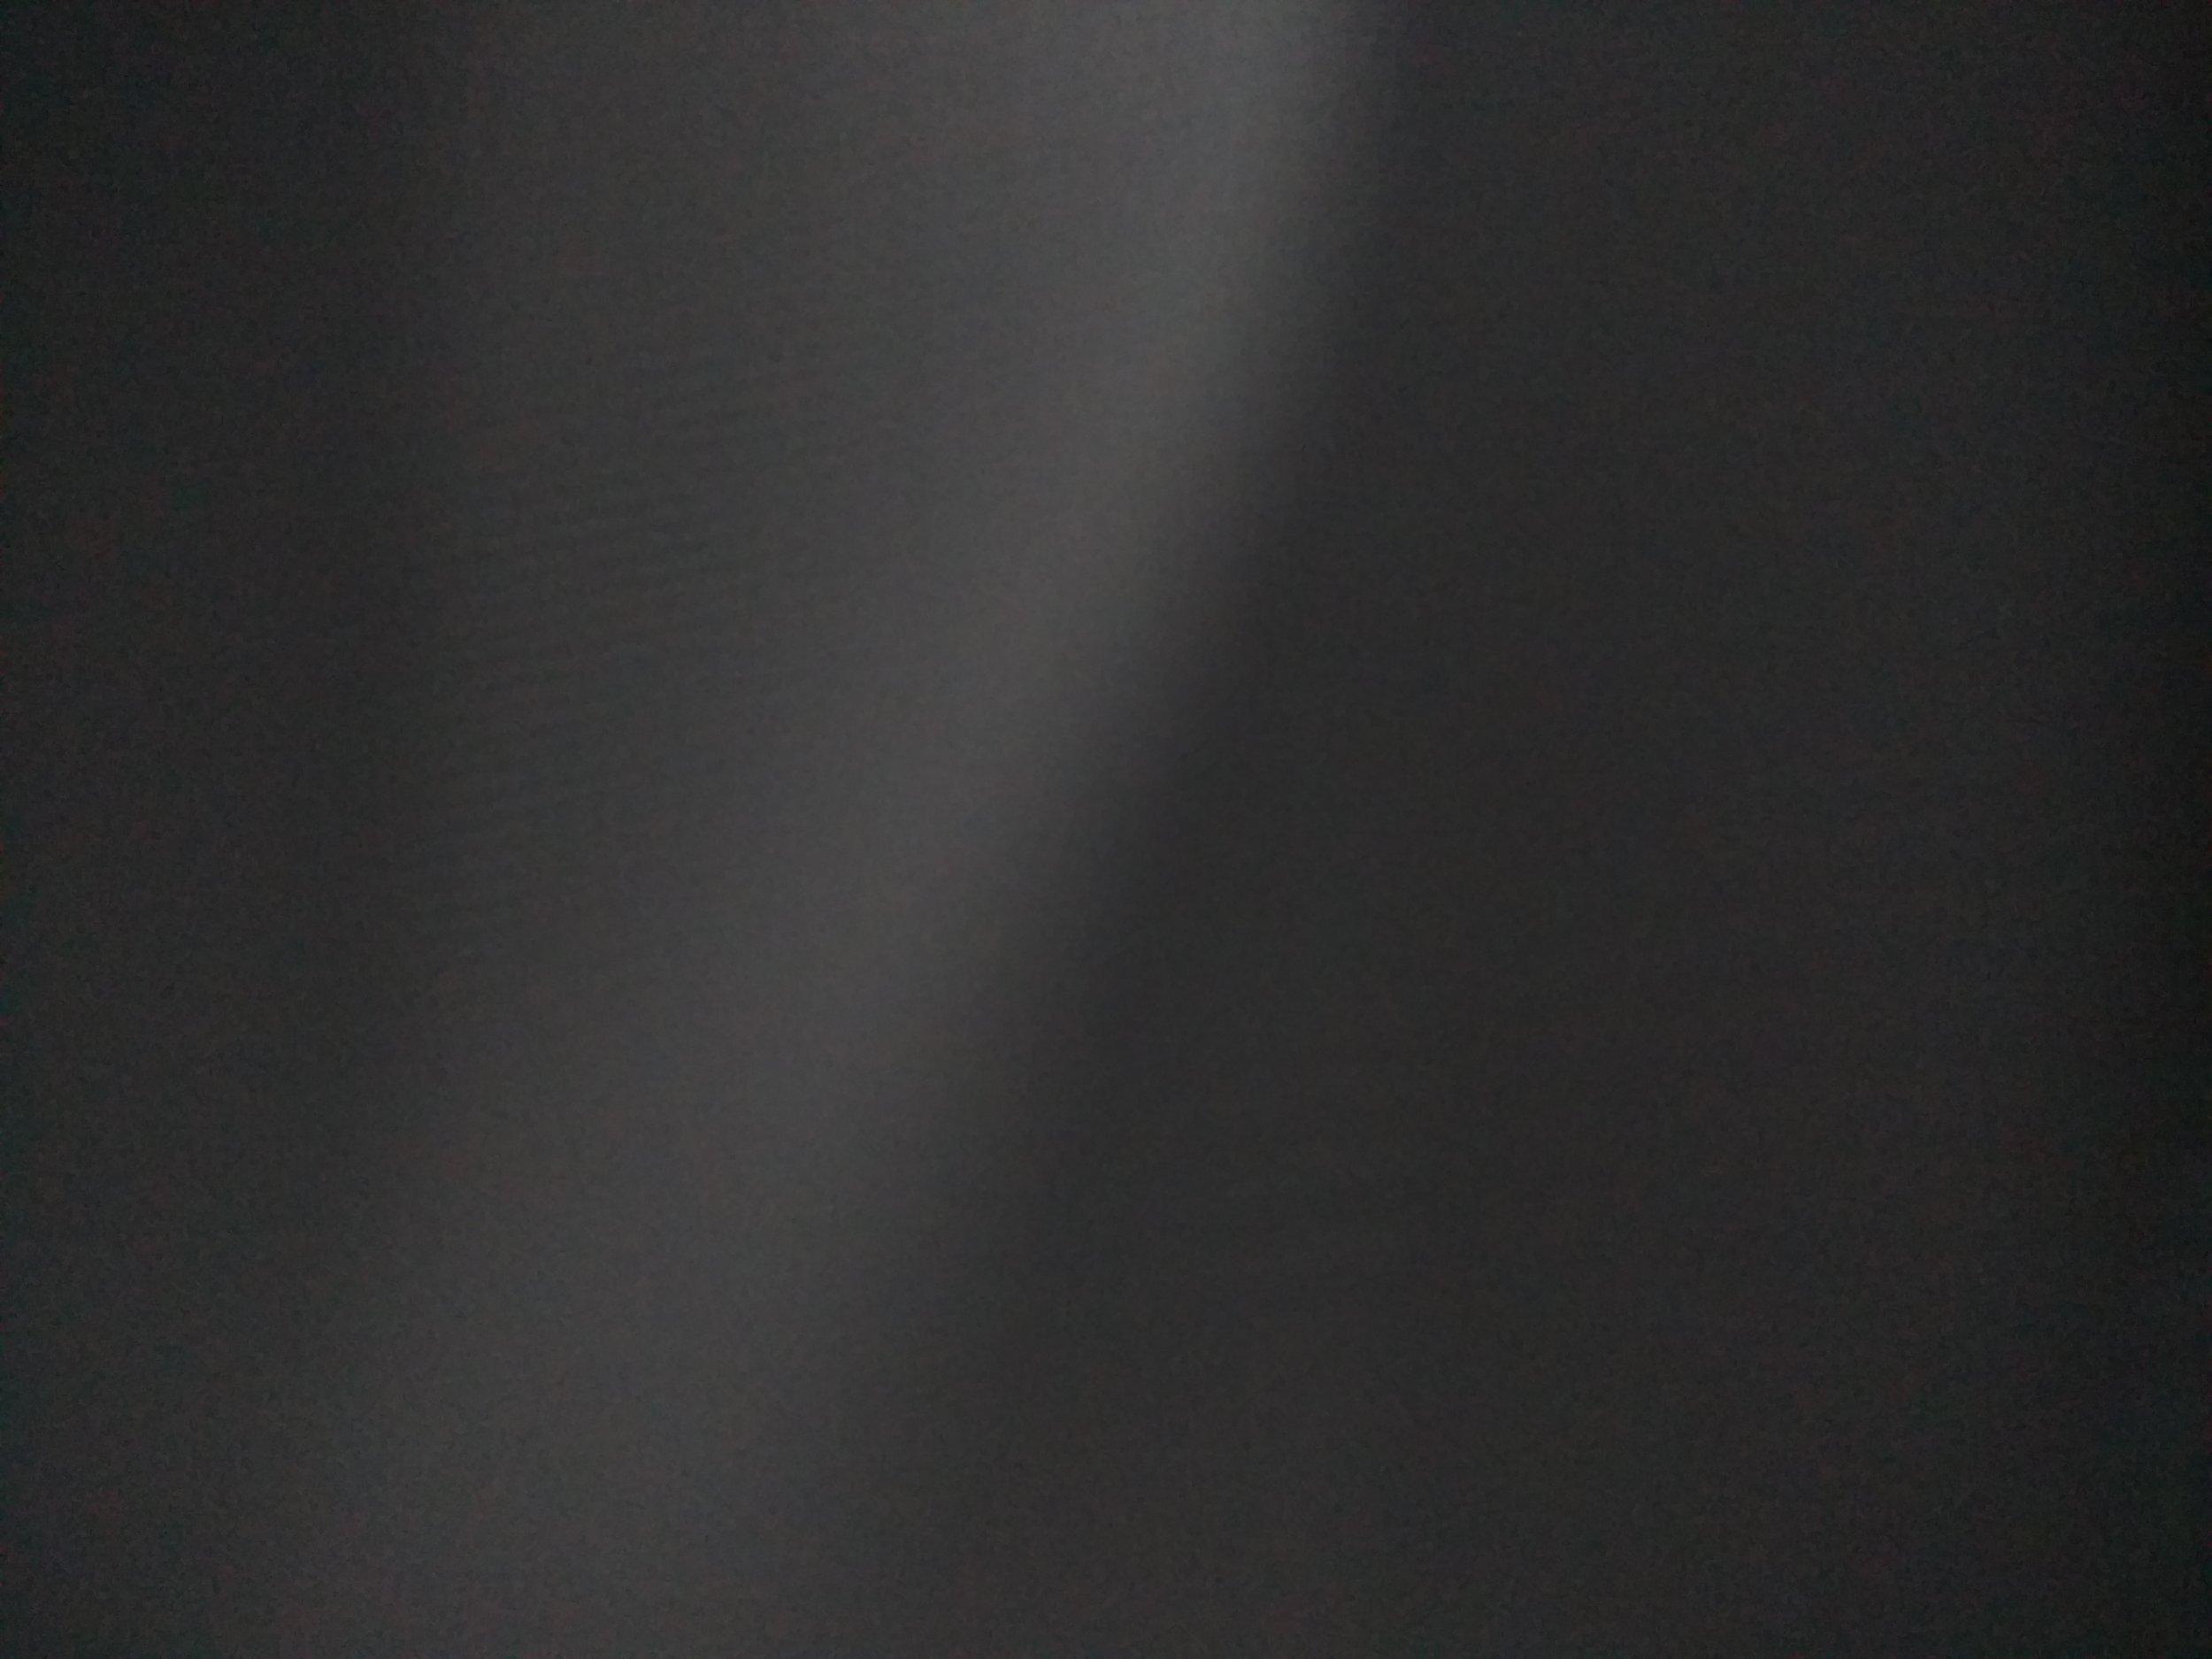 willroth-co-free-texture-gradient-033.jpg